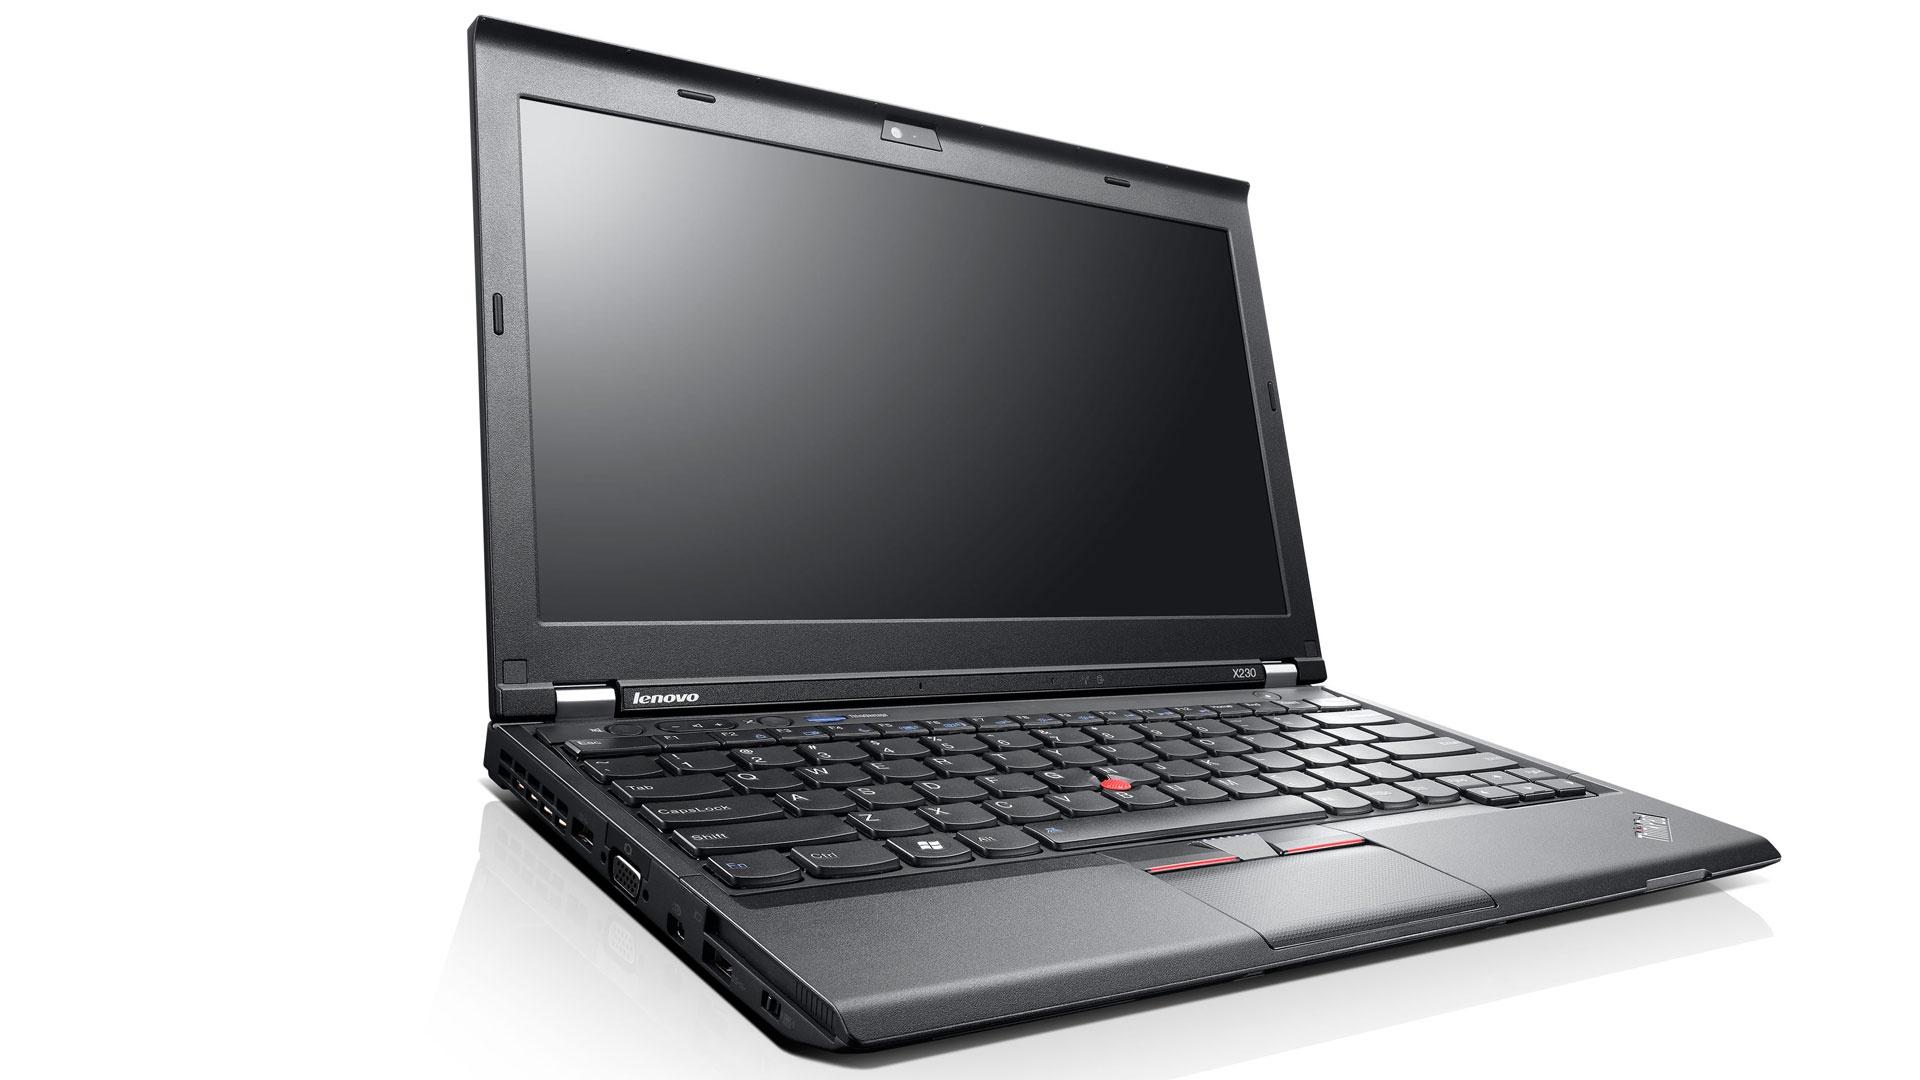 Lenovo Thinkpad X230 SSD